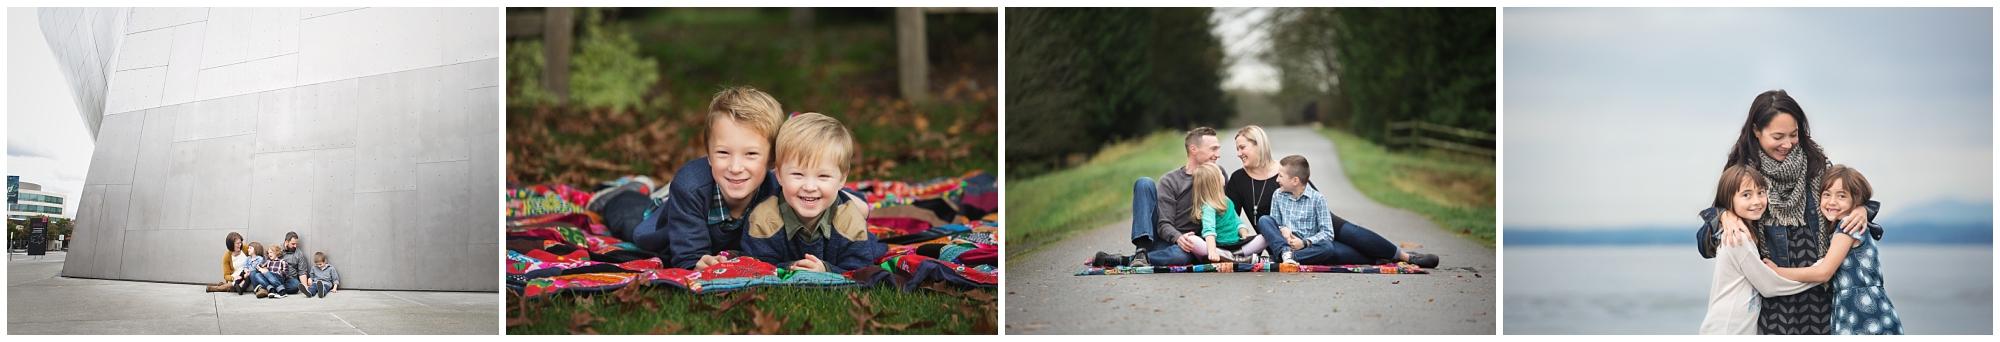 Family Photography Examples Everett Photographer